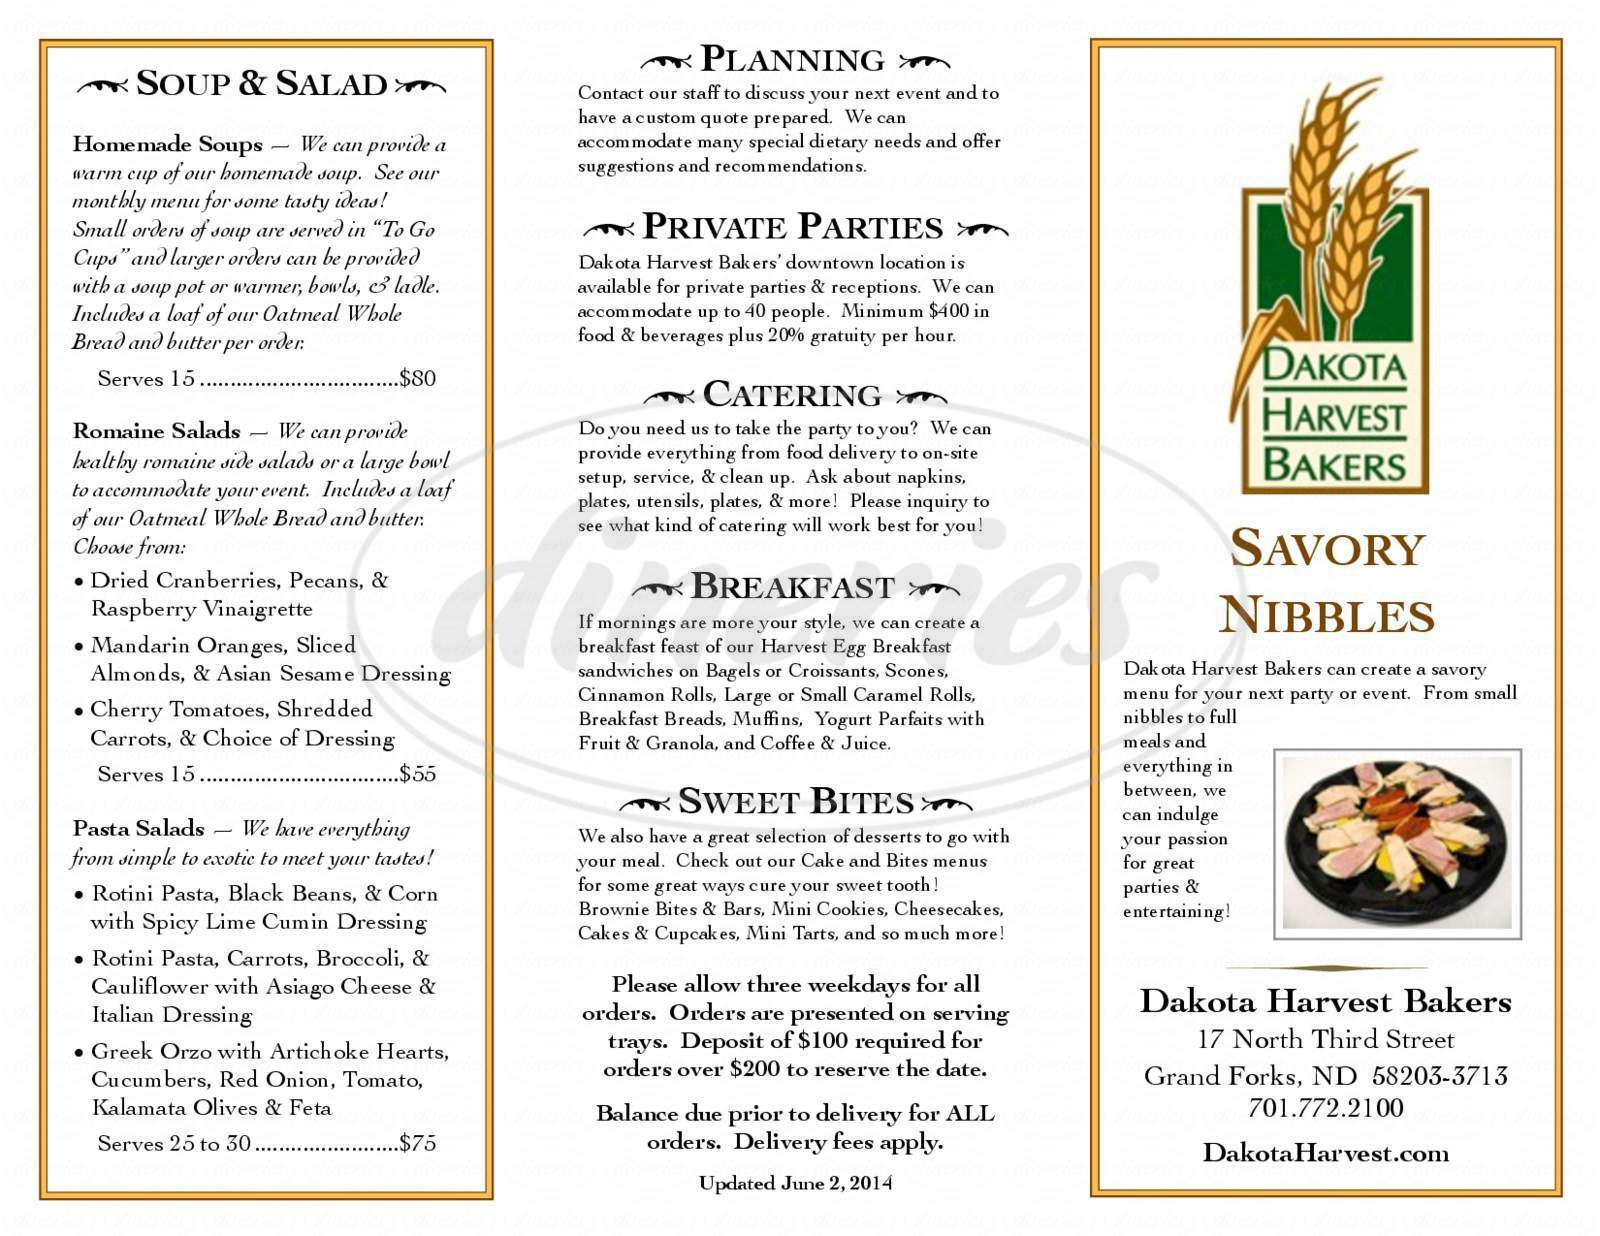 menu for Dakota Harvest Bakers